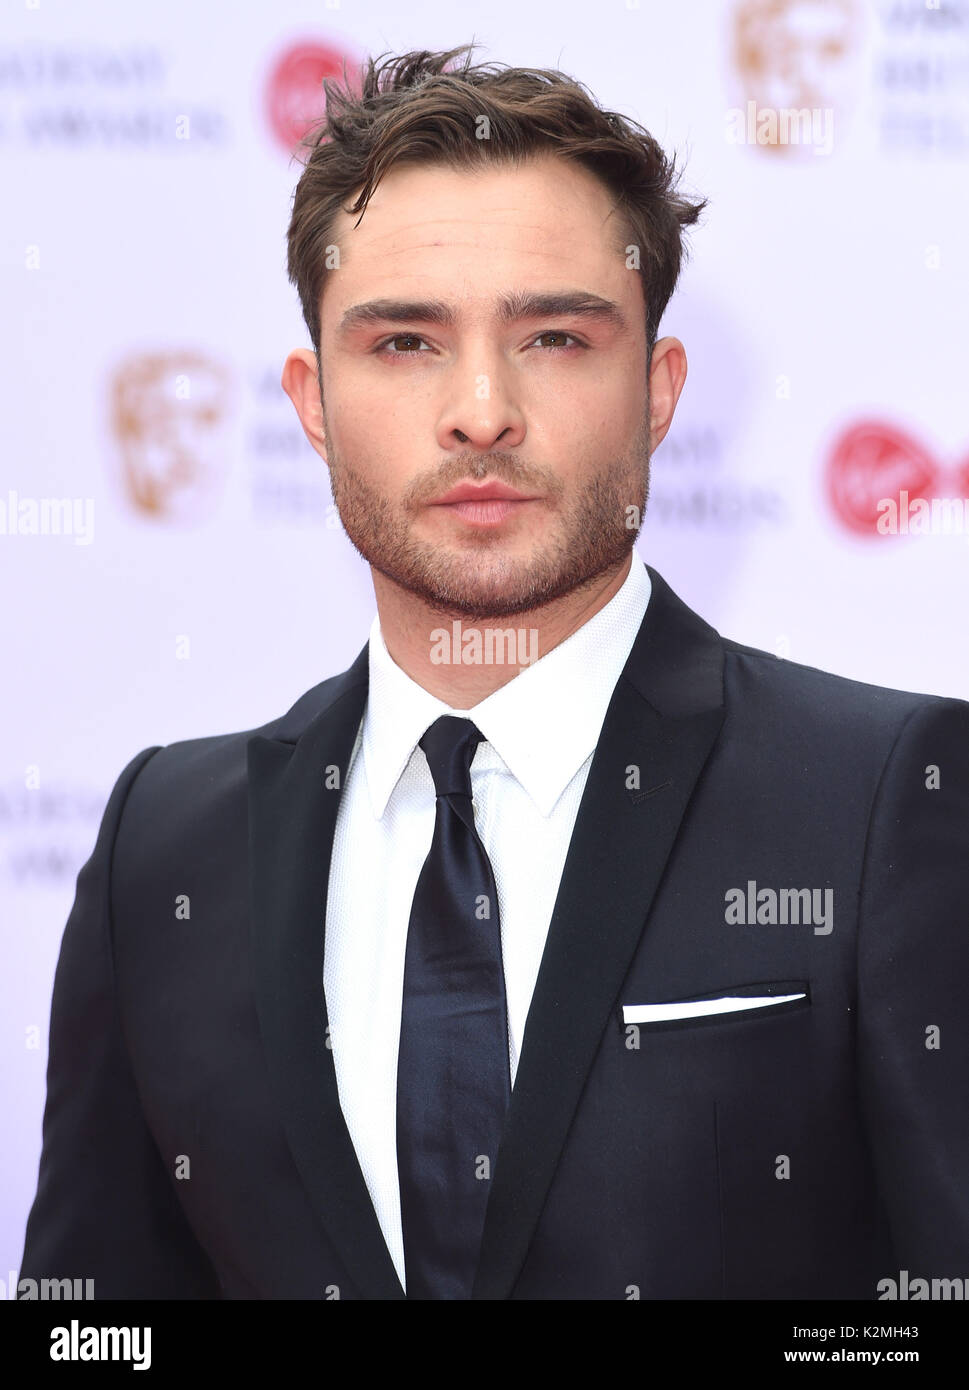 Photo Must Be Credited ©Alpha Press 079965 14/05/2017 Ed Westwick Virgin TV British Academy Television Bafta Awards 2017 at Royal Festival Hall London - Stock Image